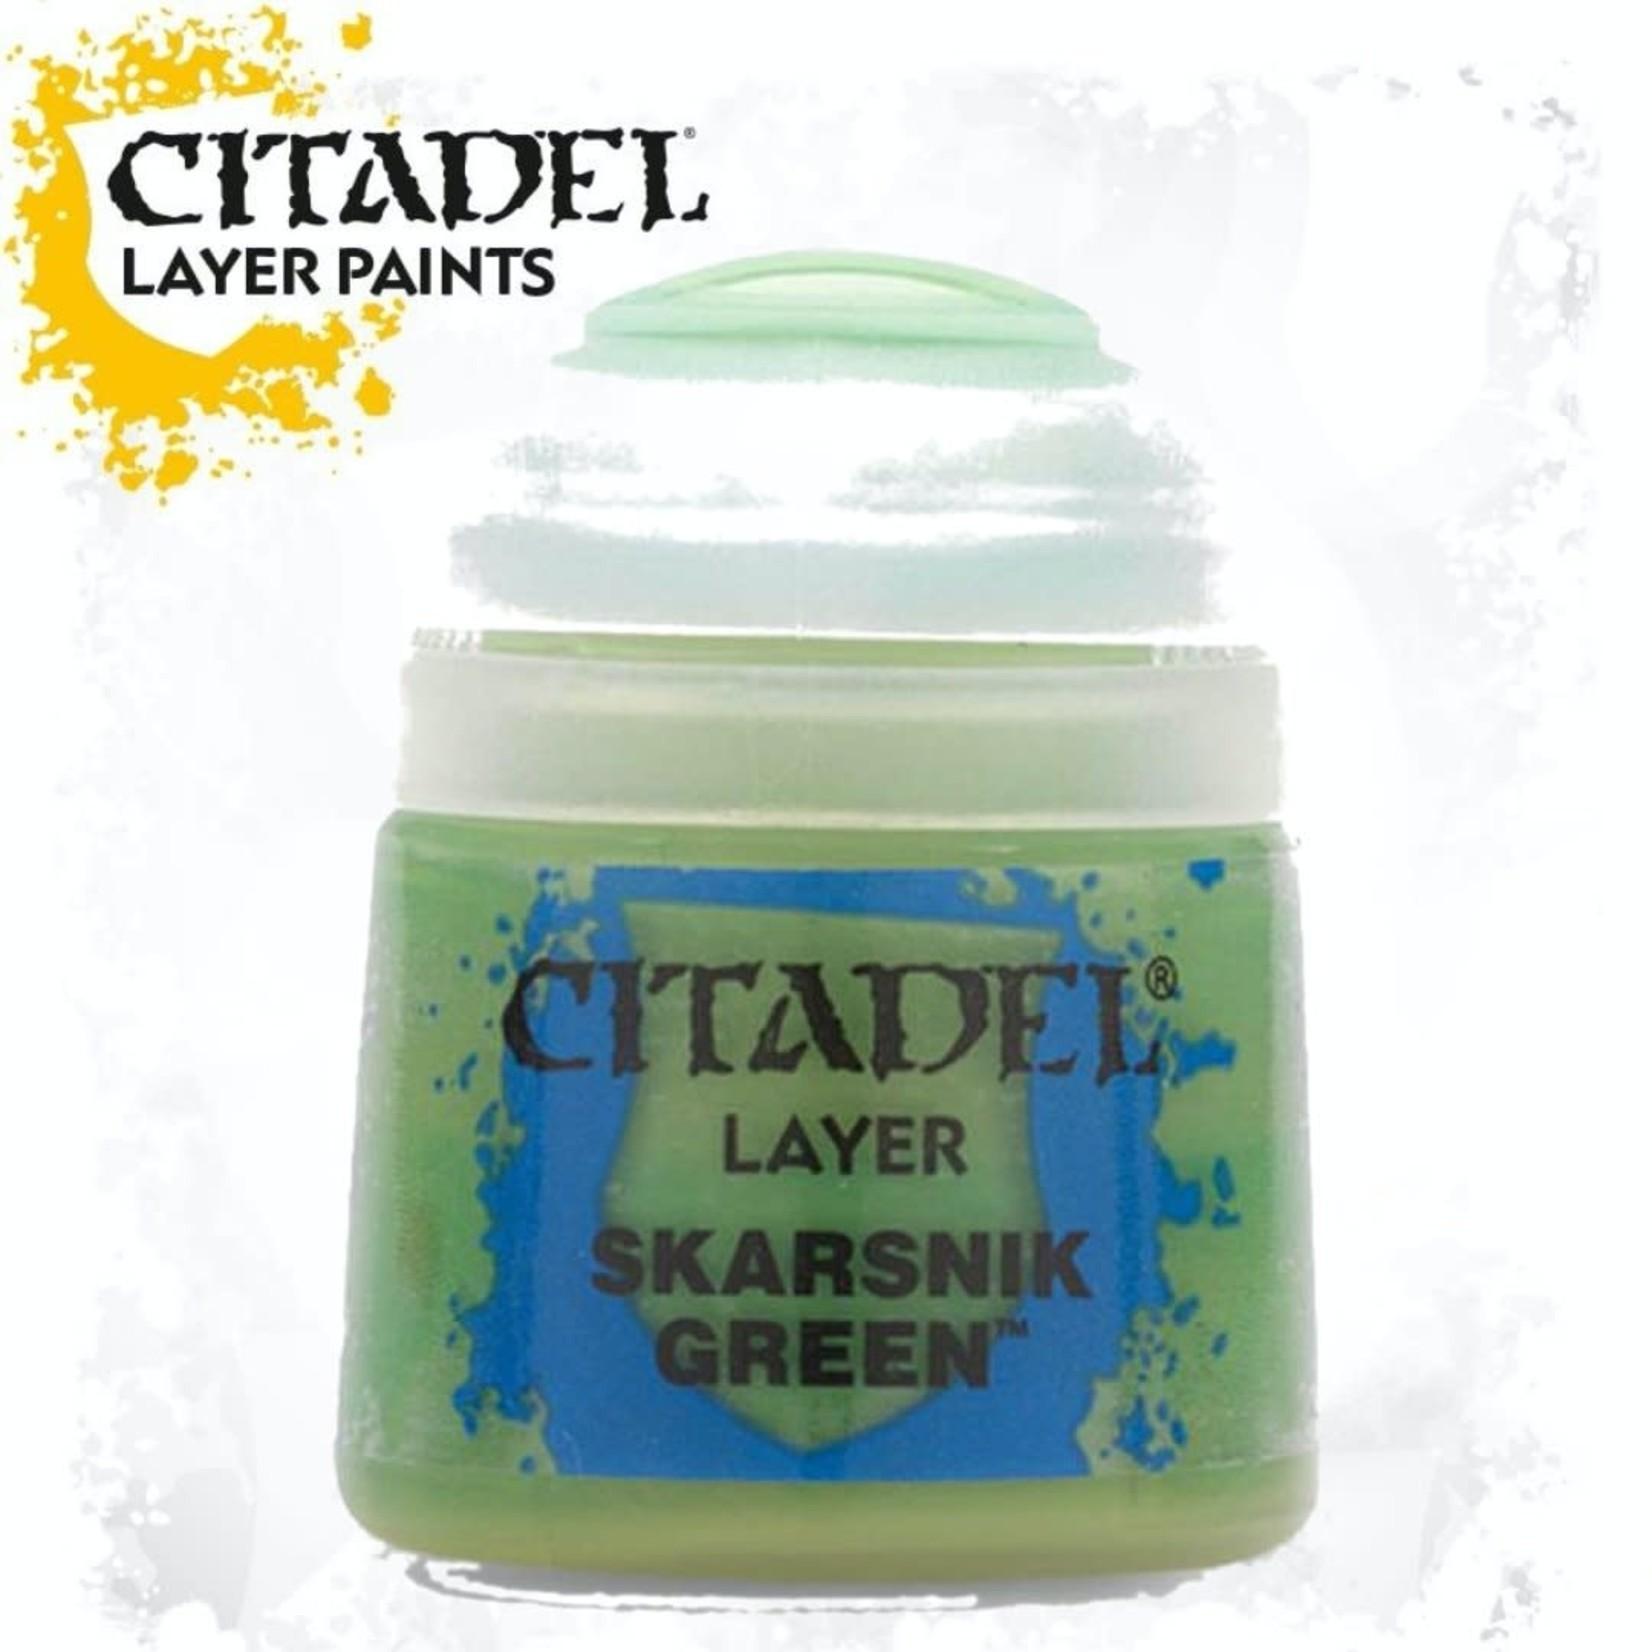 Citadel Citadel Paint - Layer: Skarsnik Green